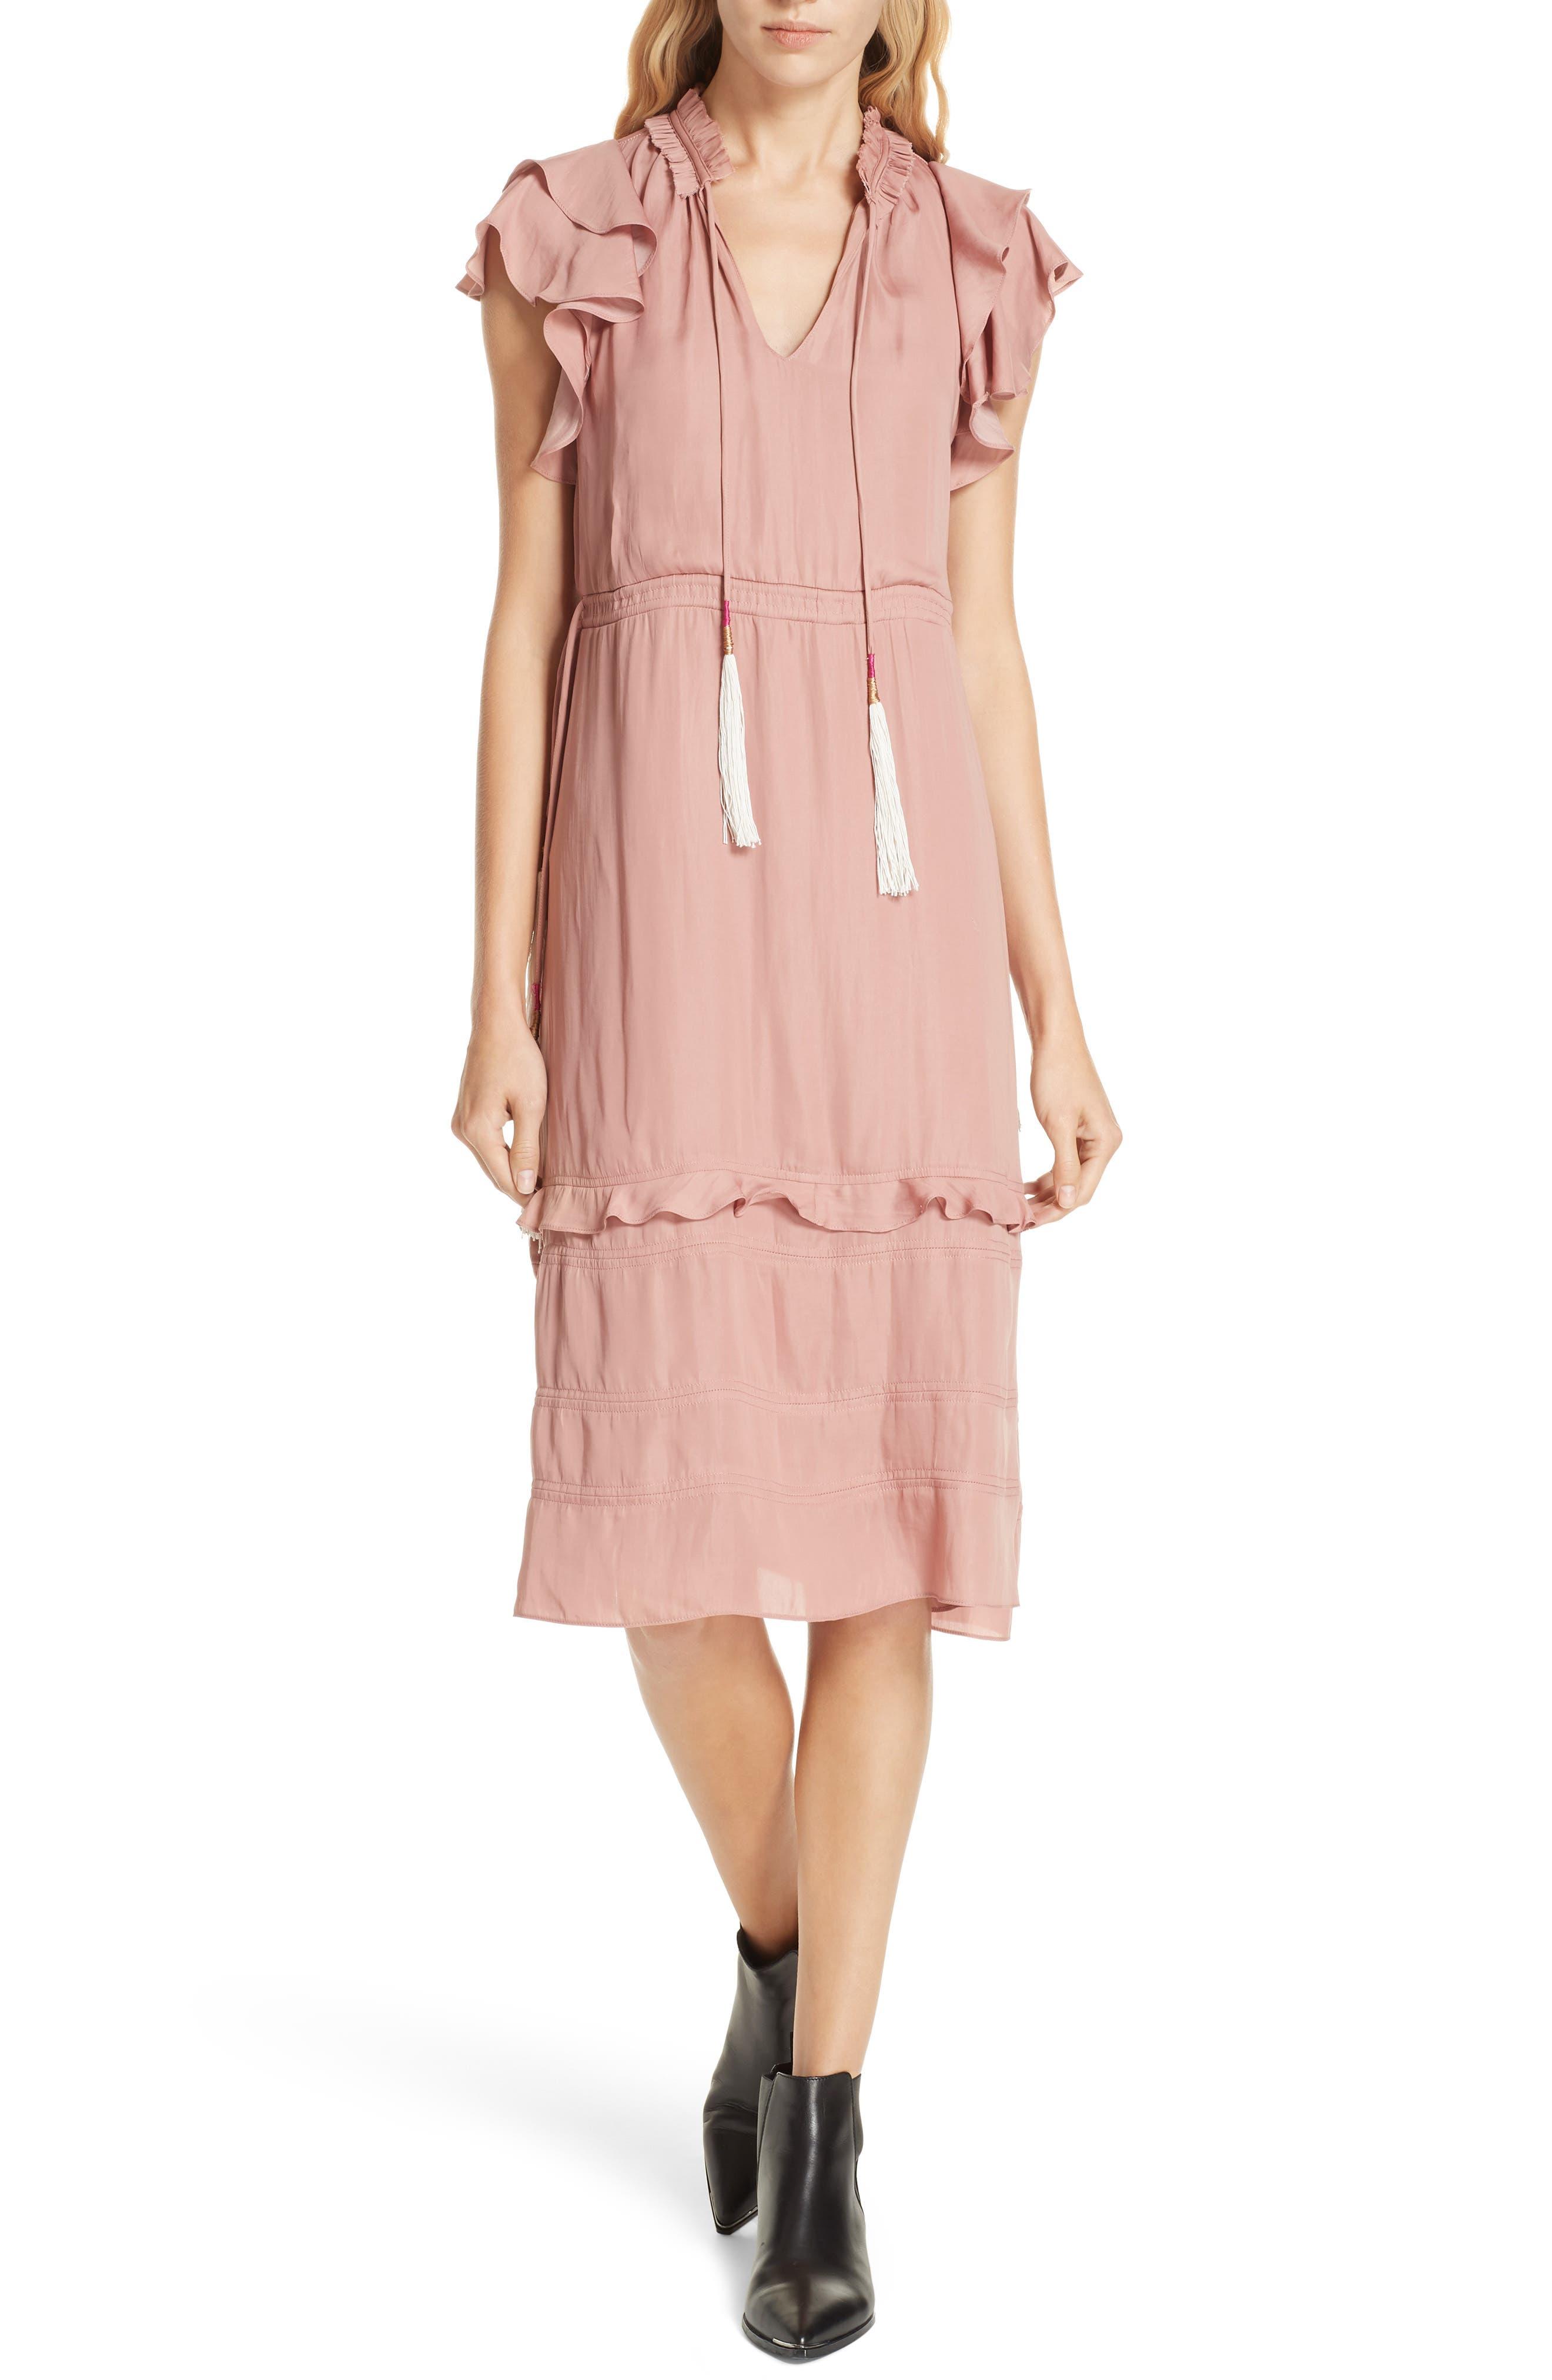 70s Dresses – Disco Dresses, Hippie Dresses, Wrap Dresses Womens Dolan Tassel Tie Midi Dress Size Medium - Pink $198.00 AT vintagedancer.com